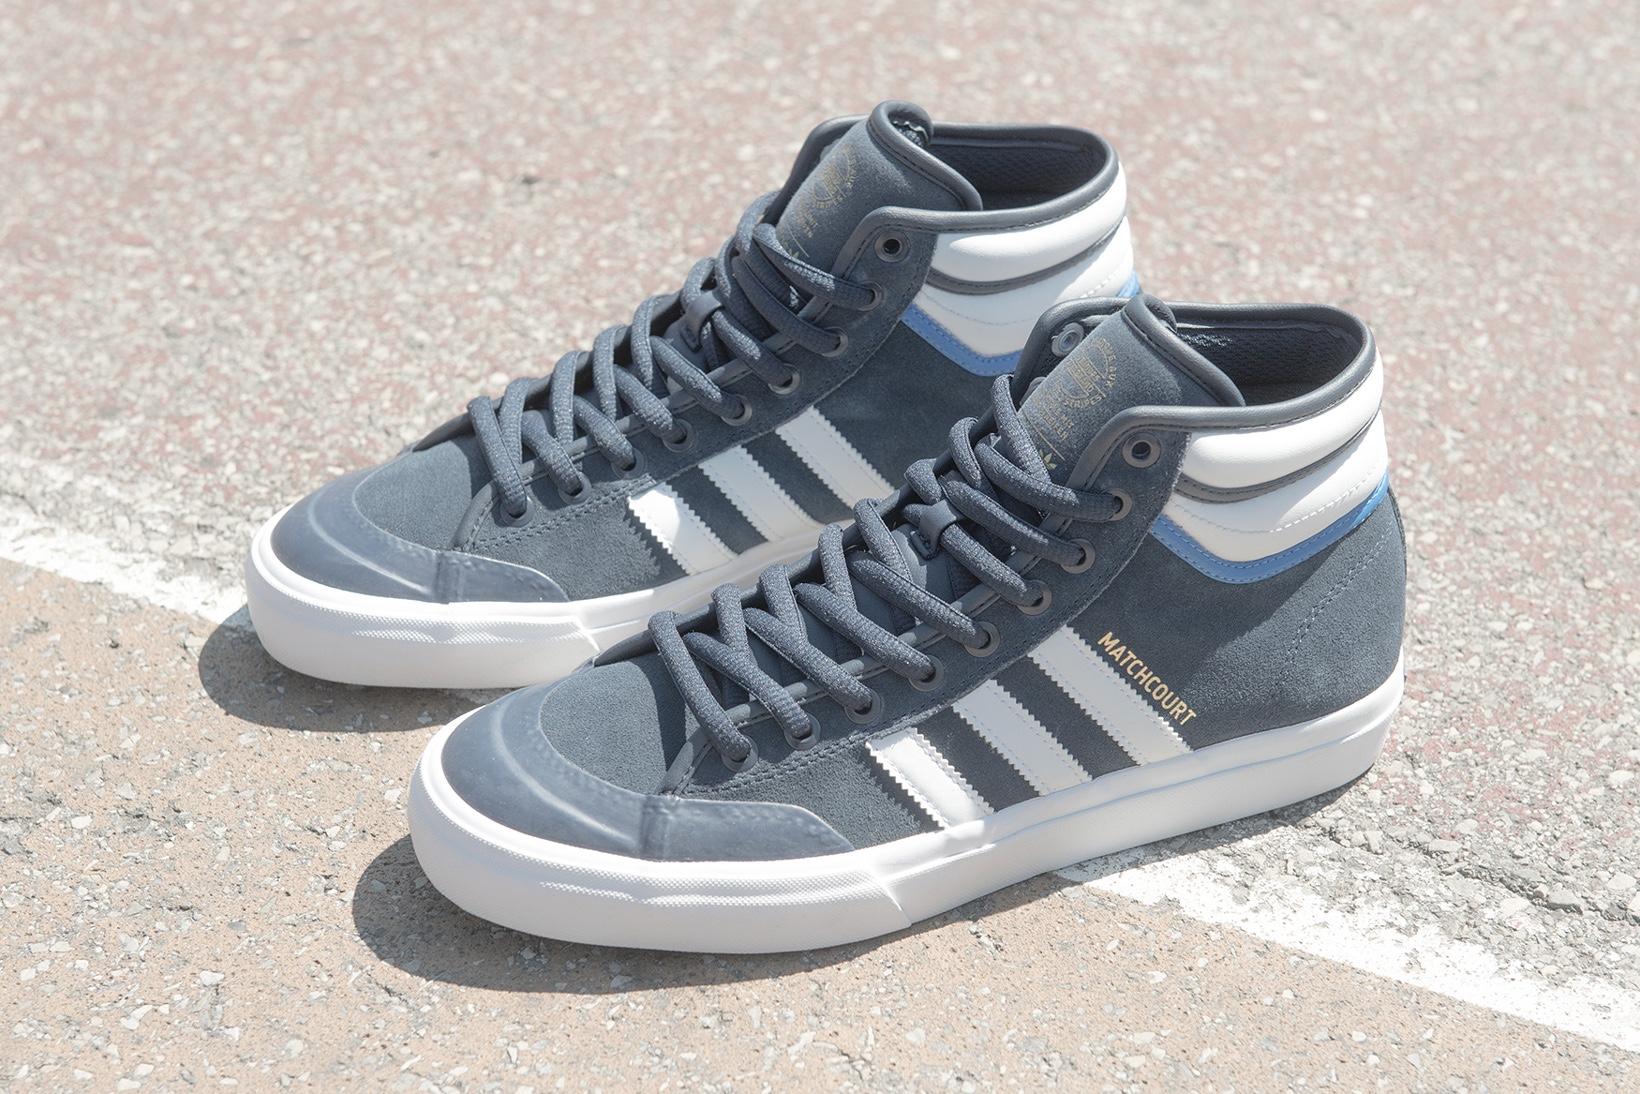 http---hypebeast.com-image-2017-06-adidas-skateboarding-matchcourt-high-rx2-1